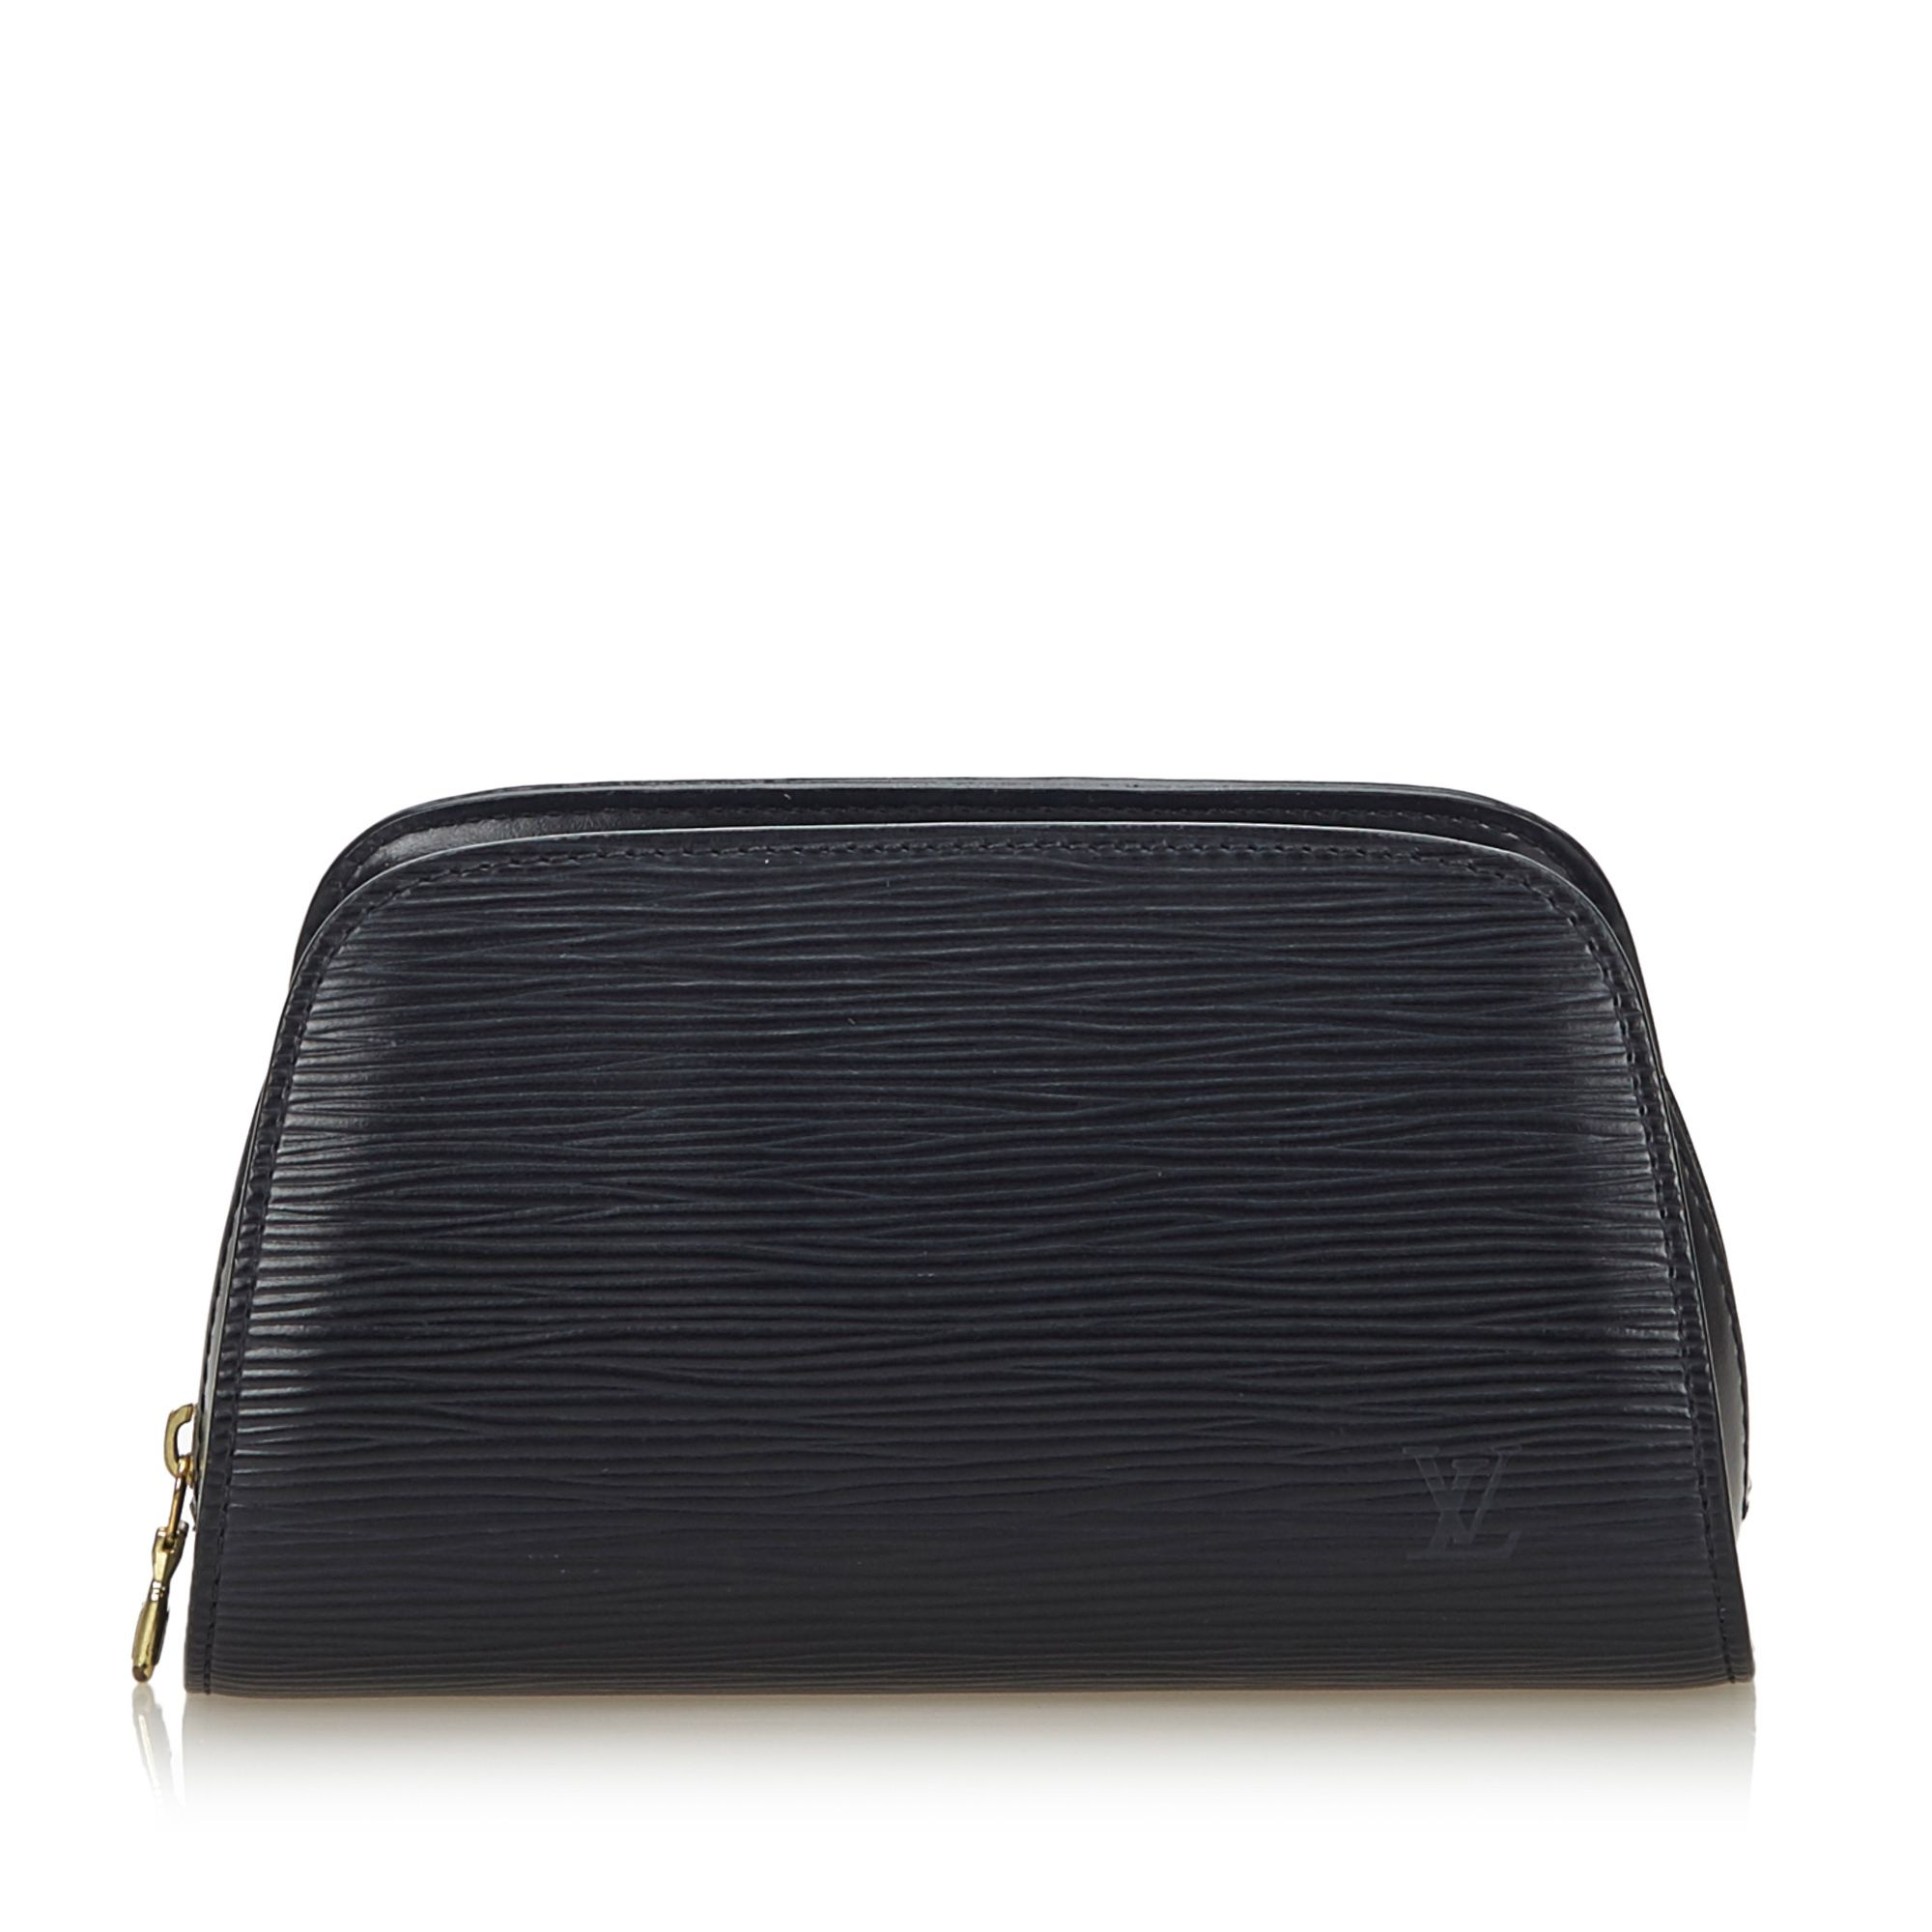 Vintage Louis Vuitton Epi Dauphine Black